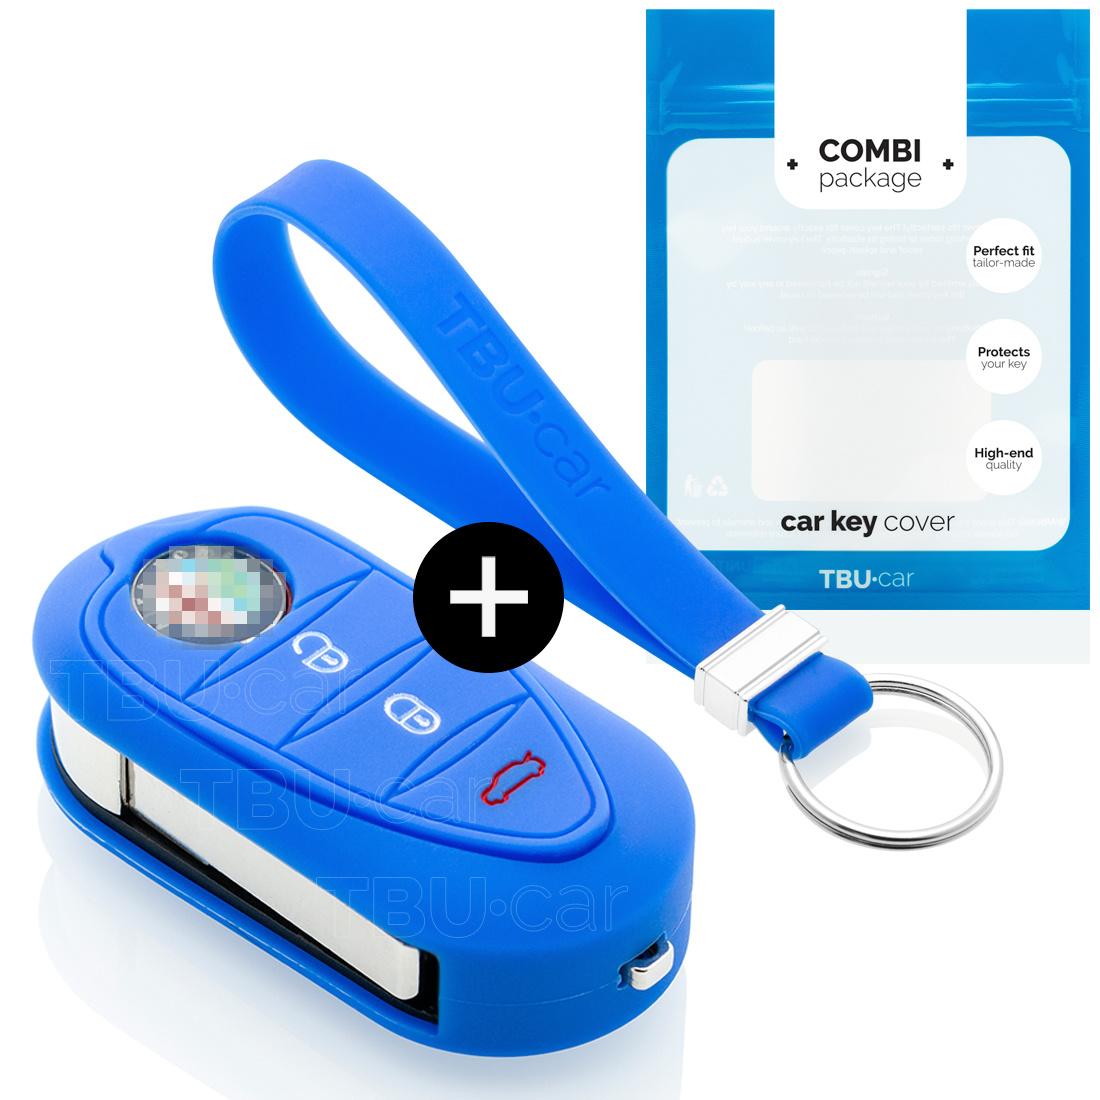 Alfa Romeo Car key cover - Silicone Protective Remote Key Shell - FOB Case Cover - Blue